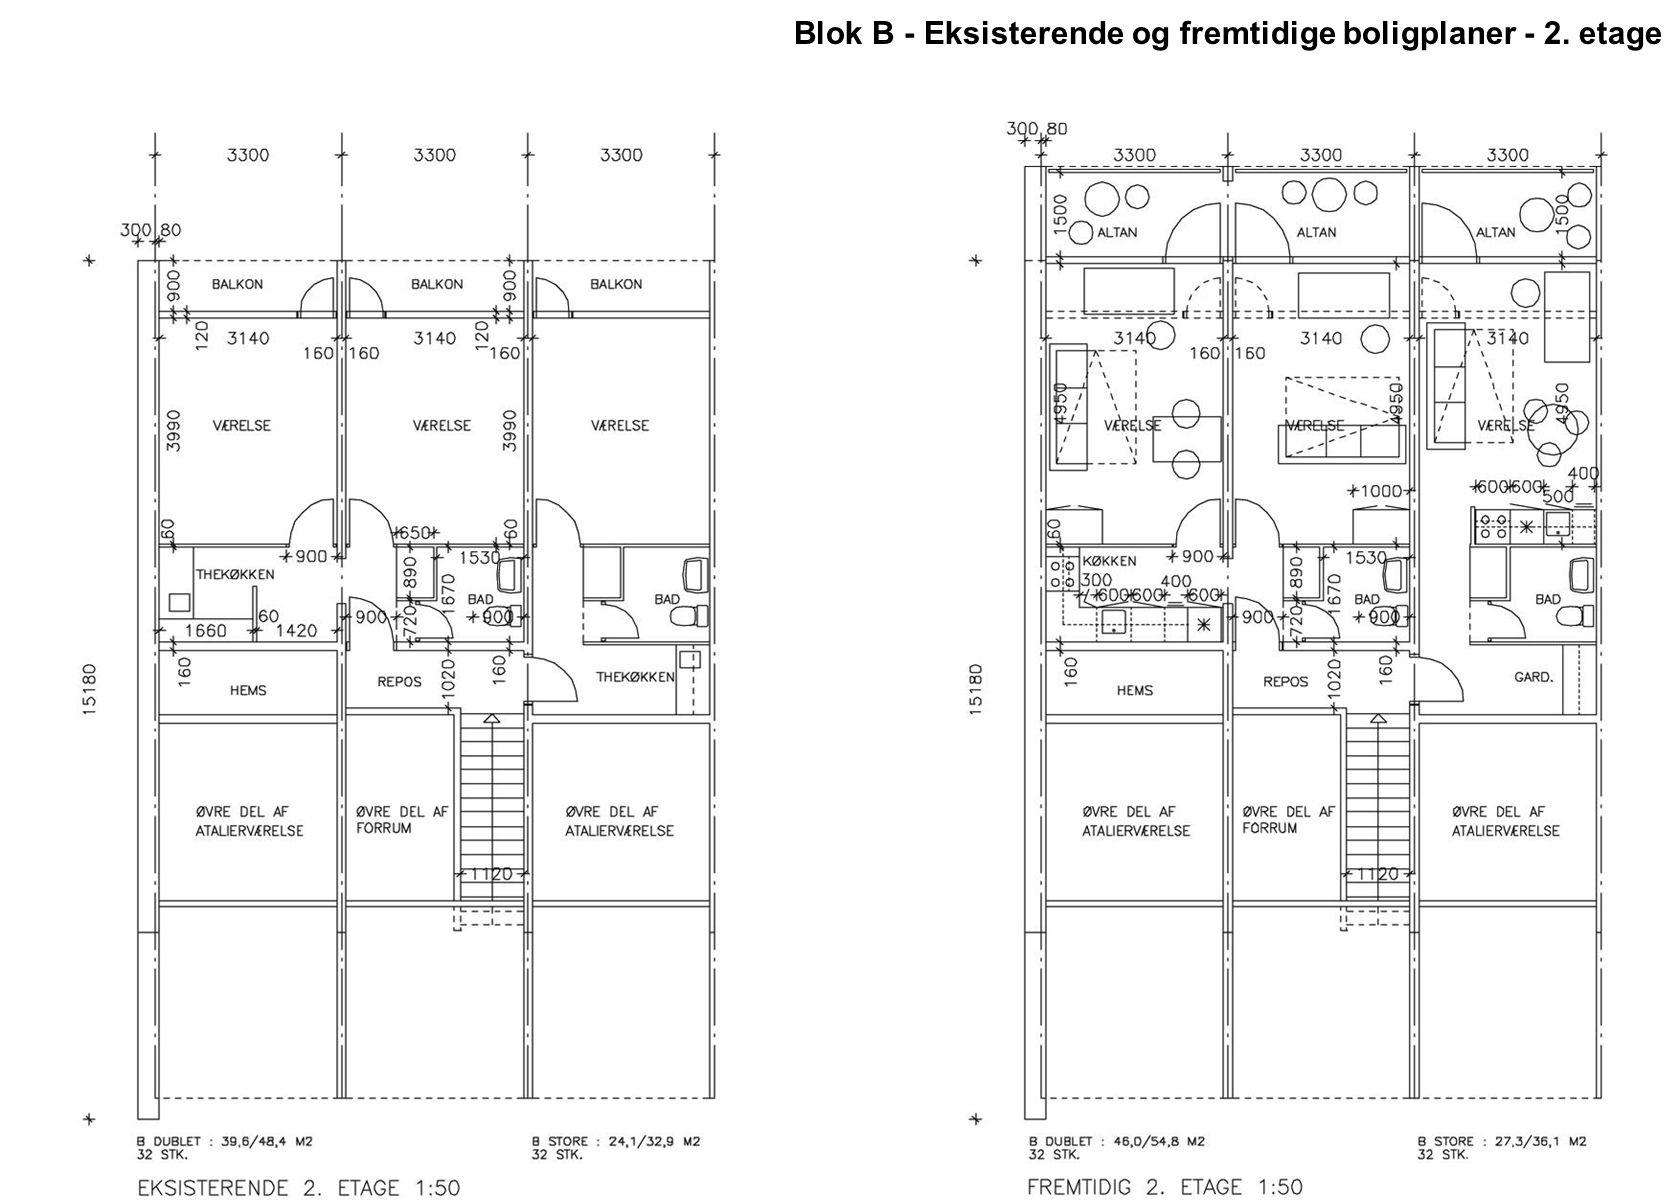 Blok B - Eksisterende og fremtidige boligplaner - 2. etage